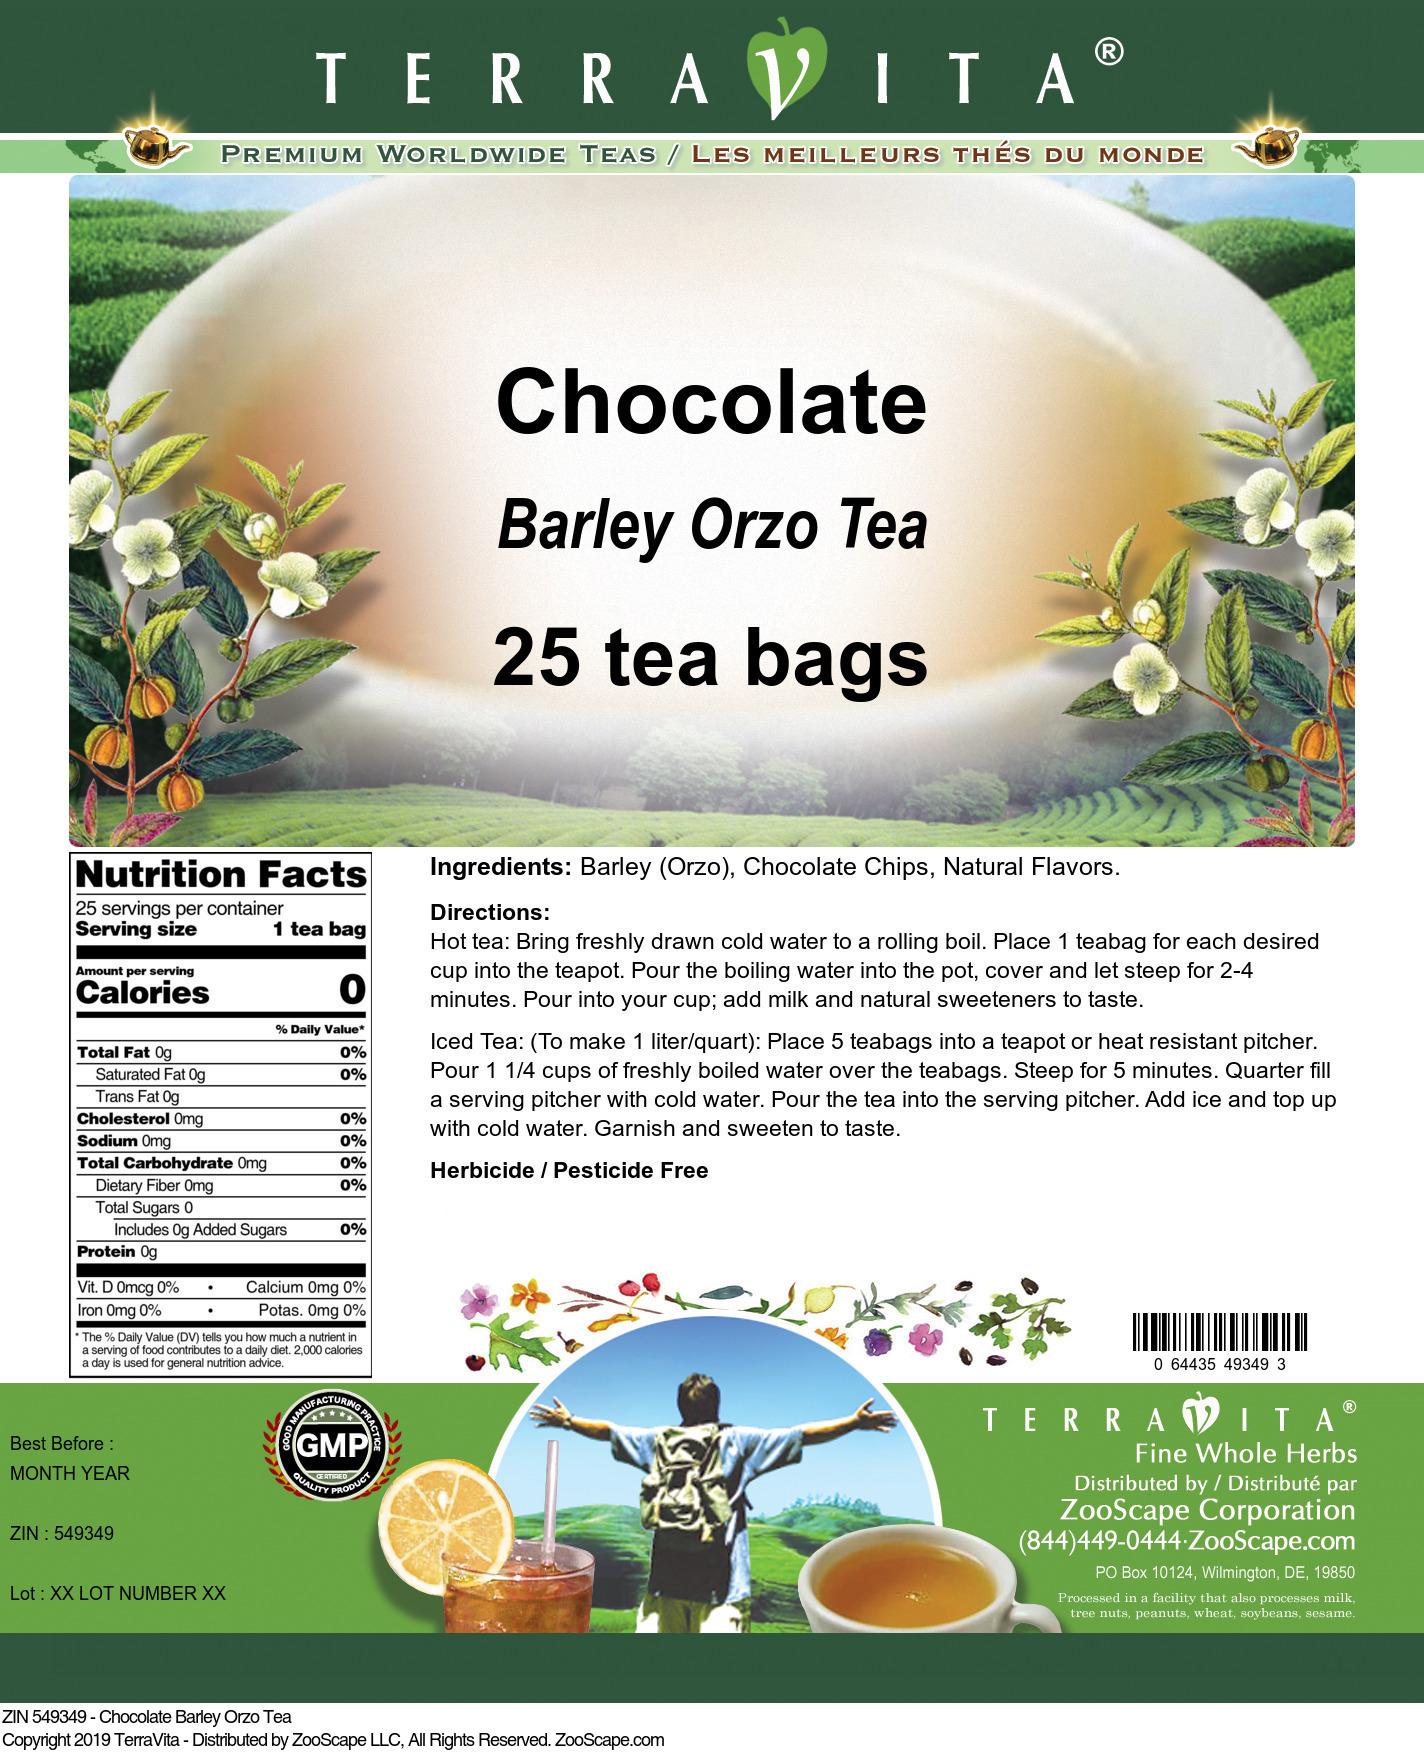 Chocolate Barley Orzo